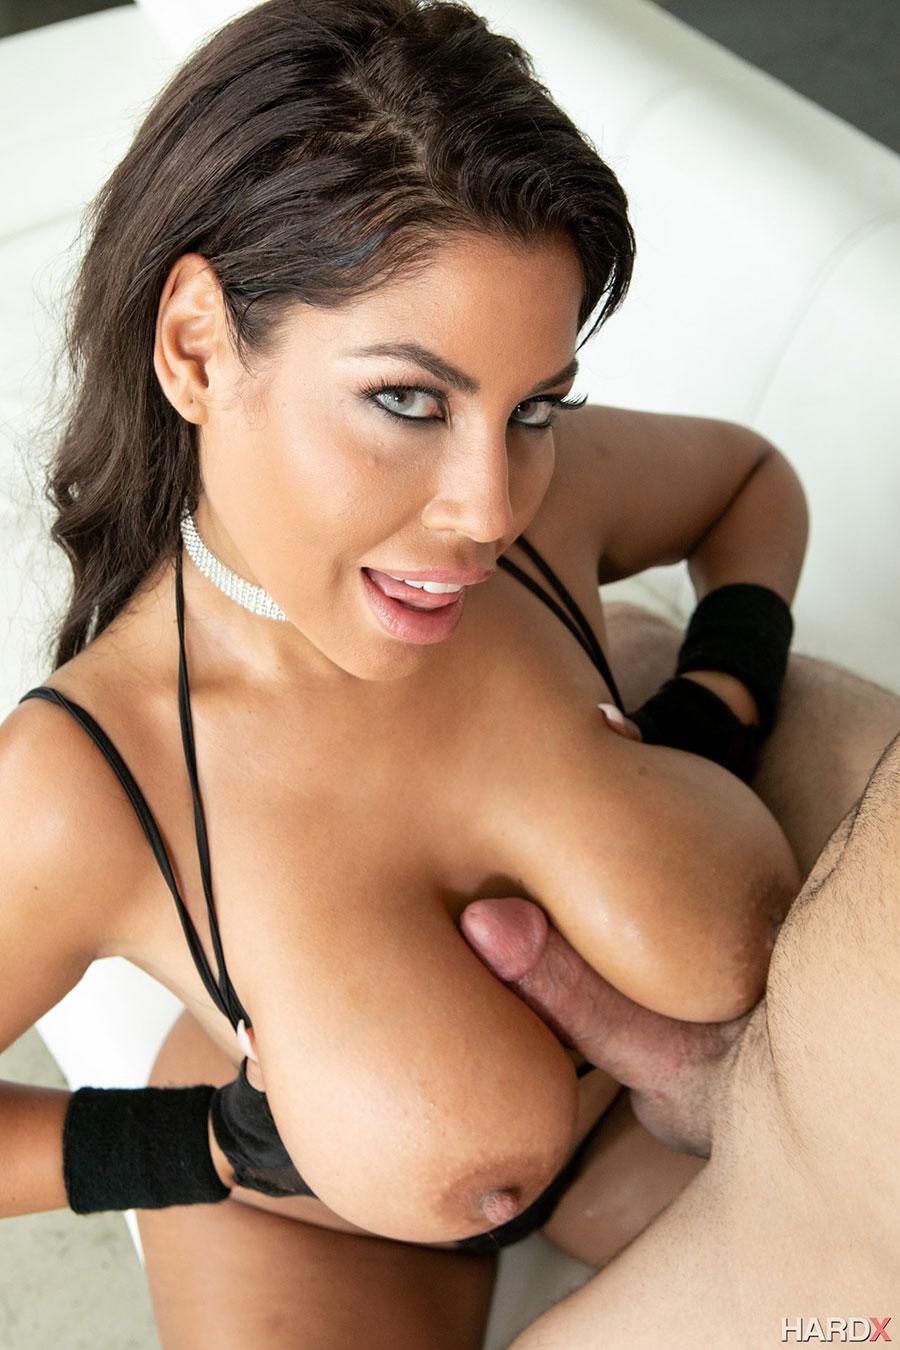 Anal And Big Boobs bridgette b big tit anal workout – the boobs blog